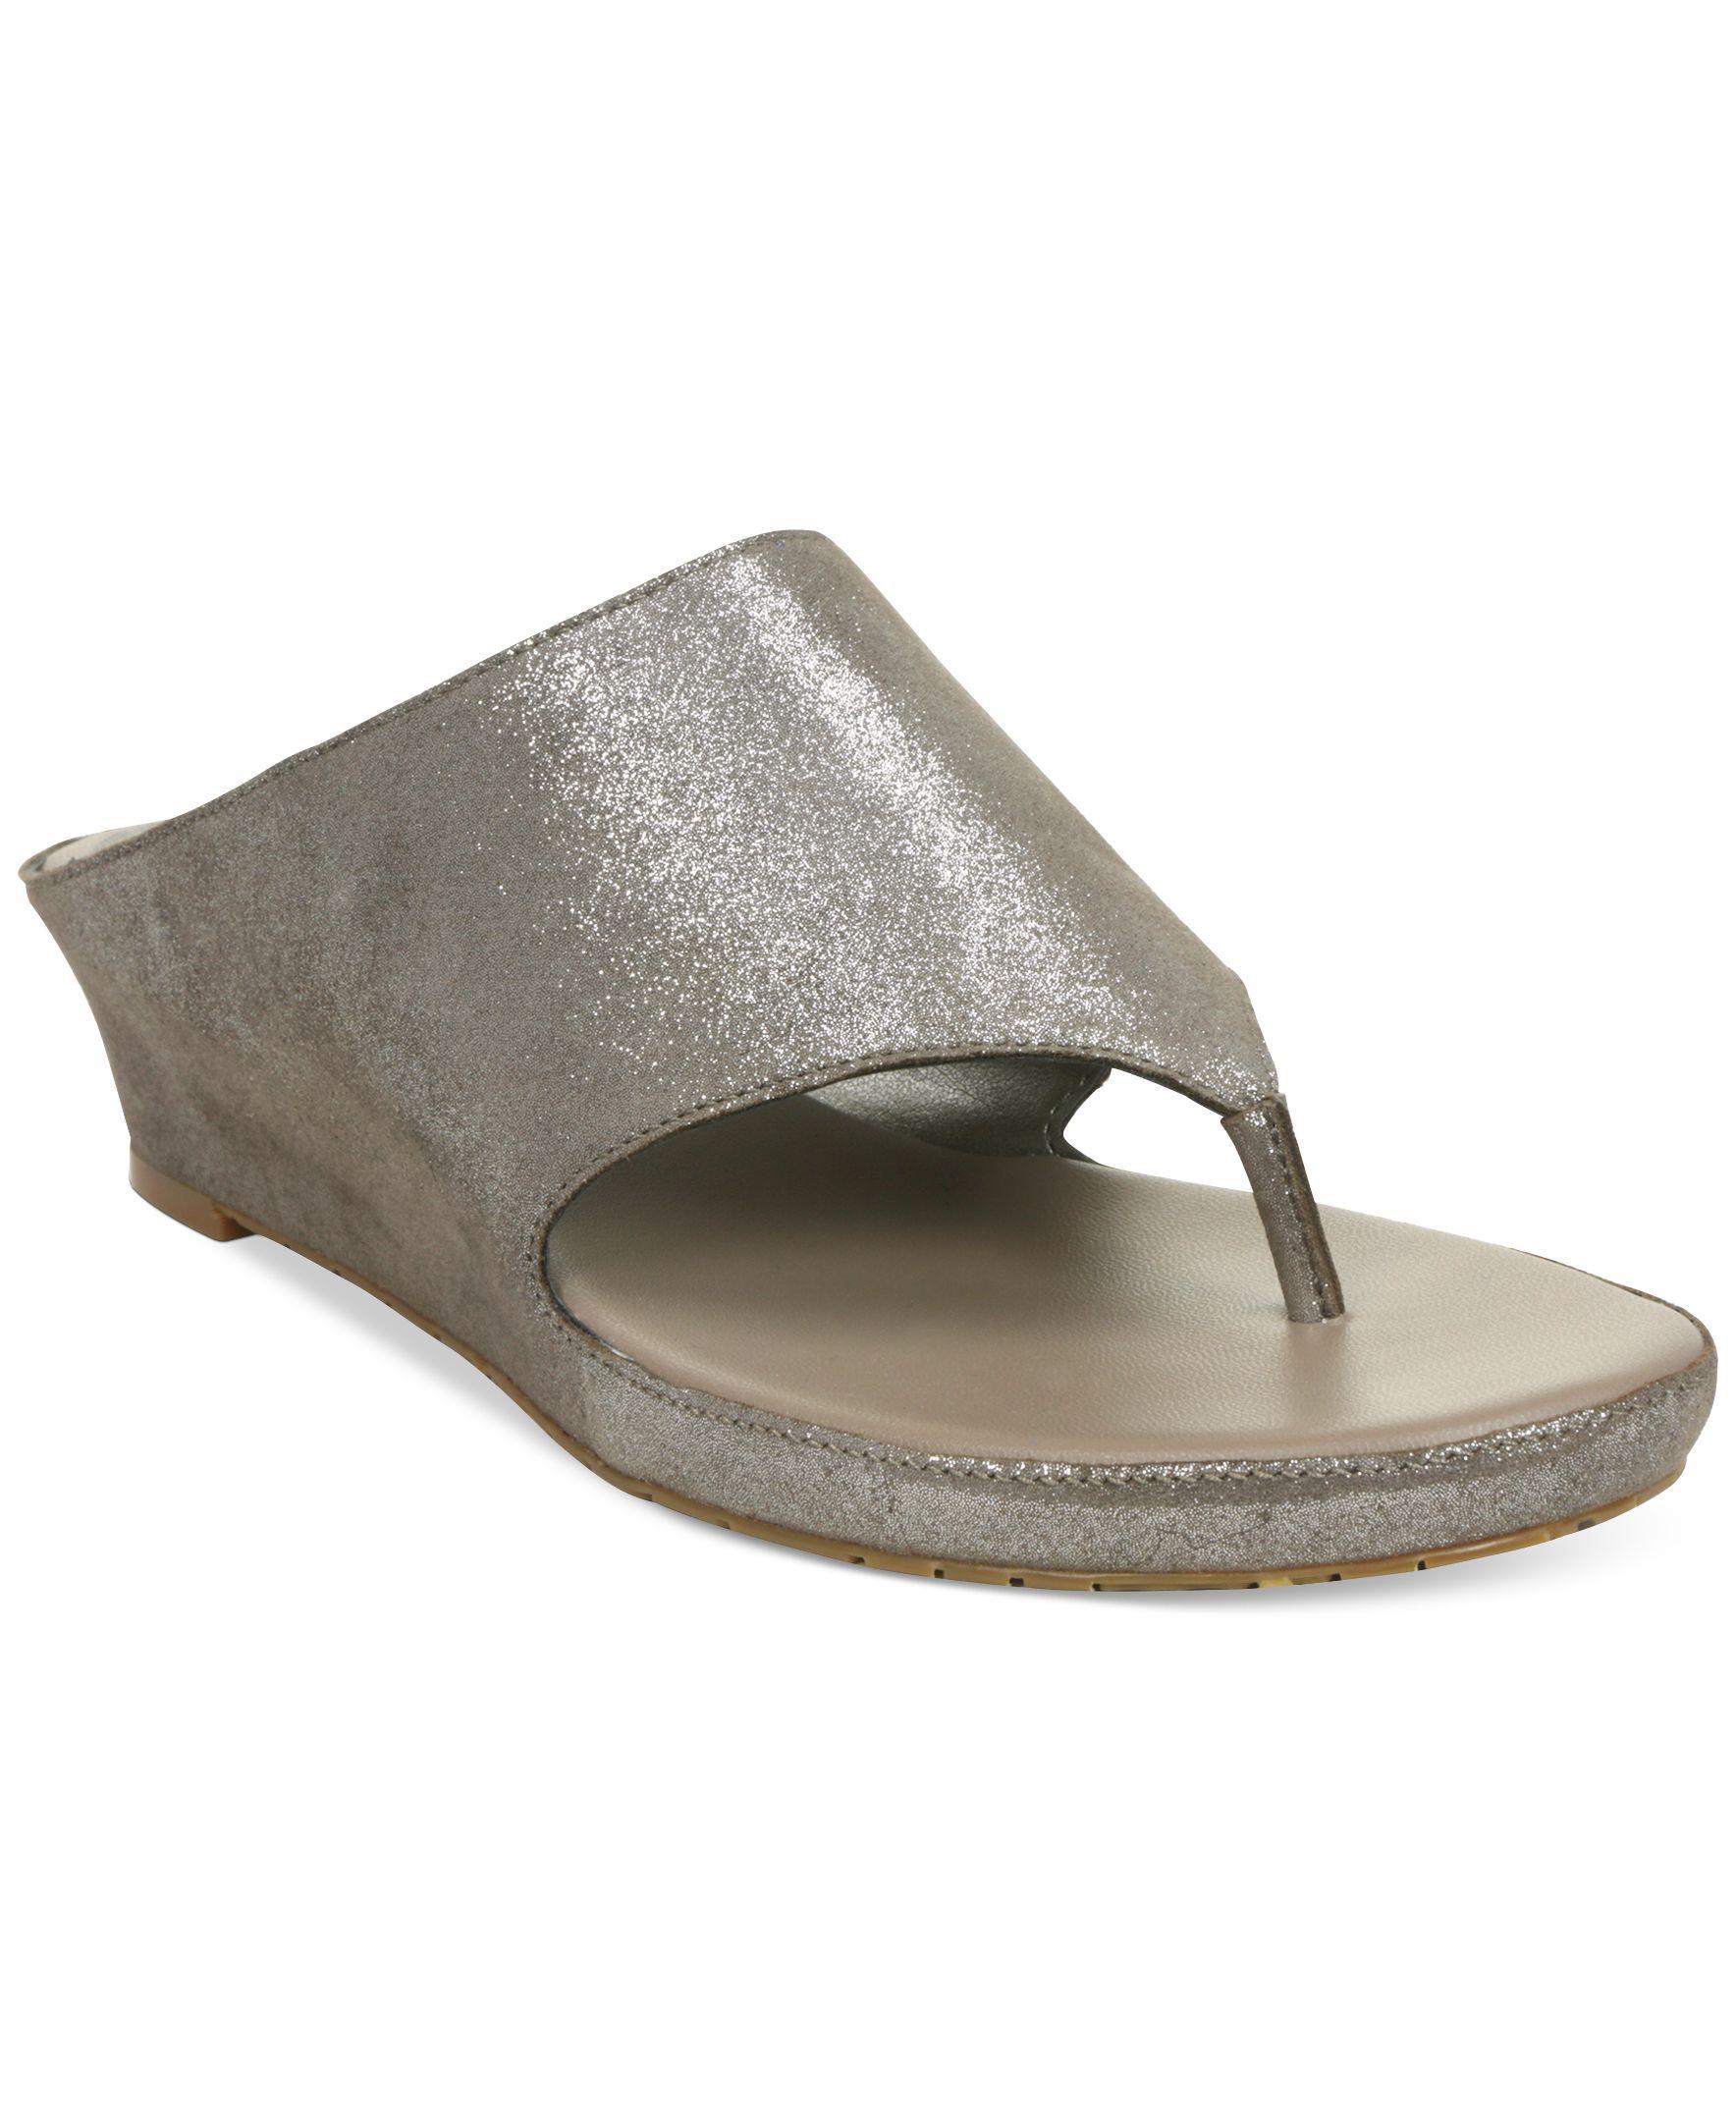 be3c679f8 Tahari Mindy Wedge Thong Sandals - Sandals - Shoes - Macy s